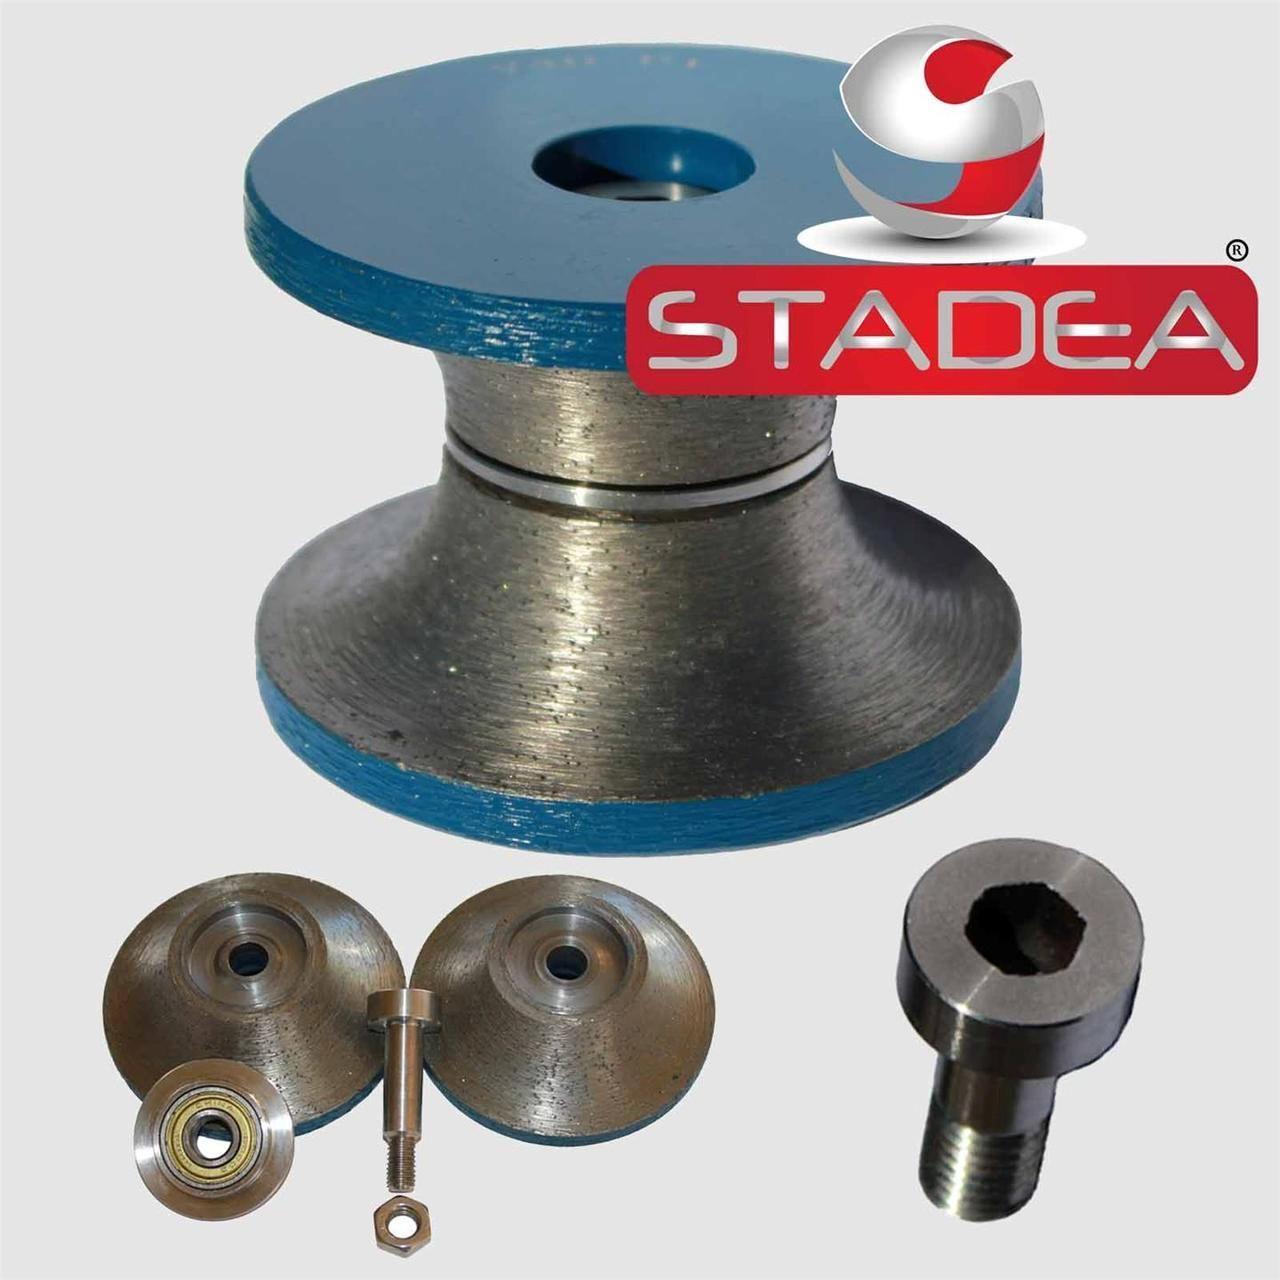 Stadea Stone Diamond Router Bits Full Bullnose 1 1 2 Inch Edge Profile Bit Grit 150 For Granite Marble Concrete Profiling V40 Router Bits Granite Stone Granite